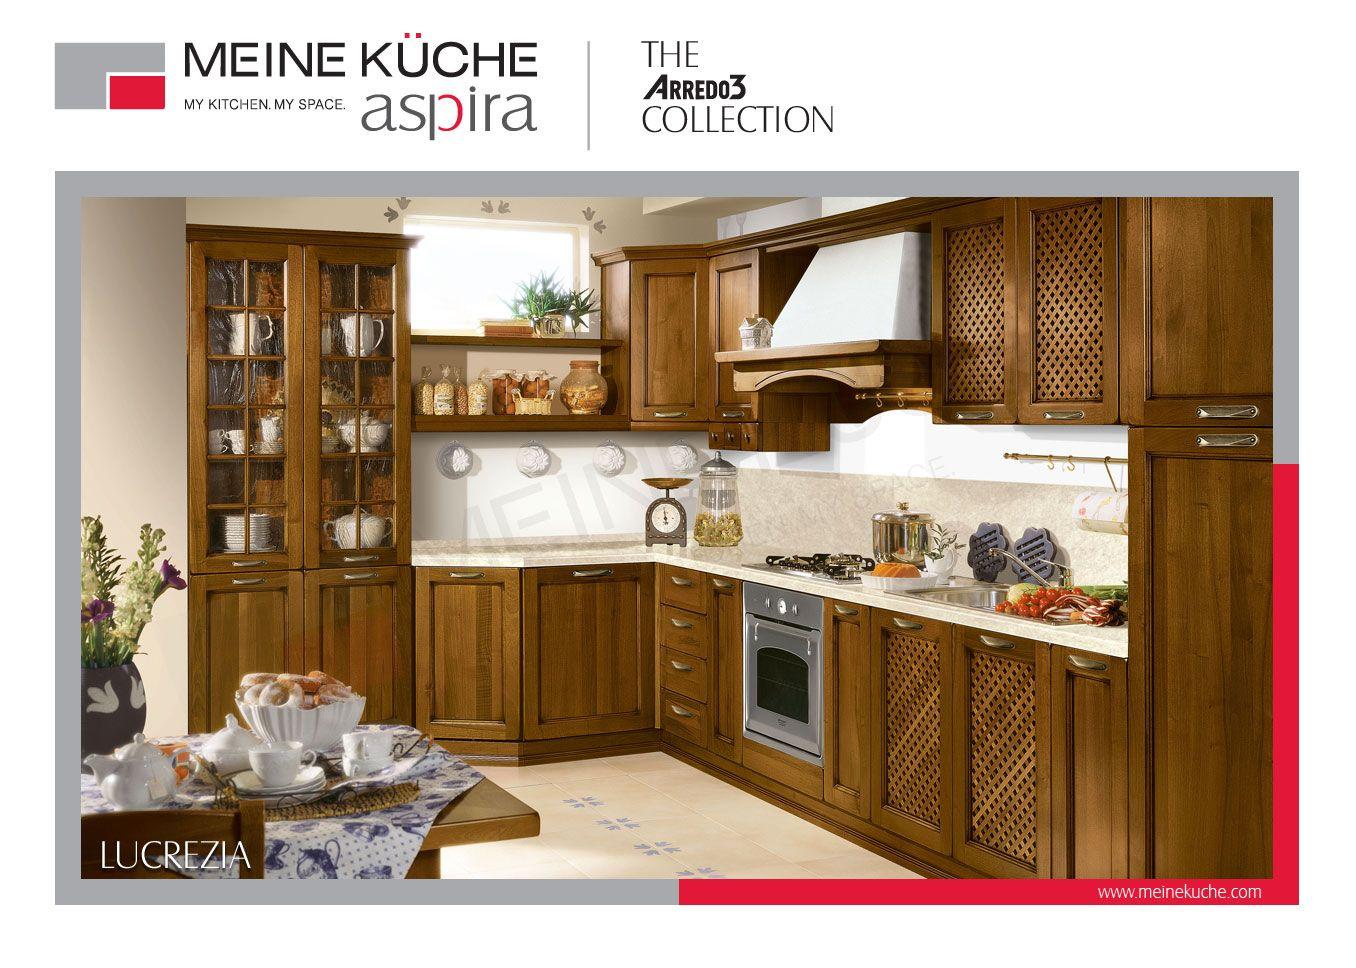 Classic Kitchens from Arredo3 Collection - Lucrezia | Arredo3 ...